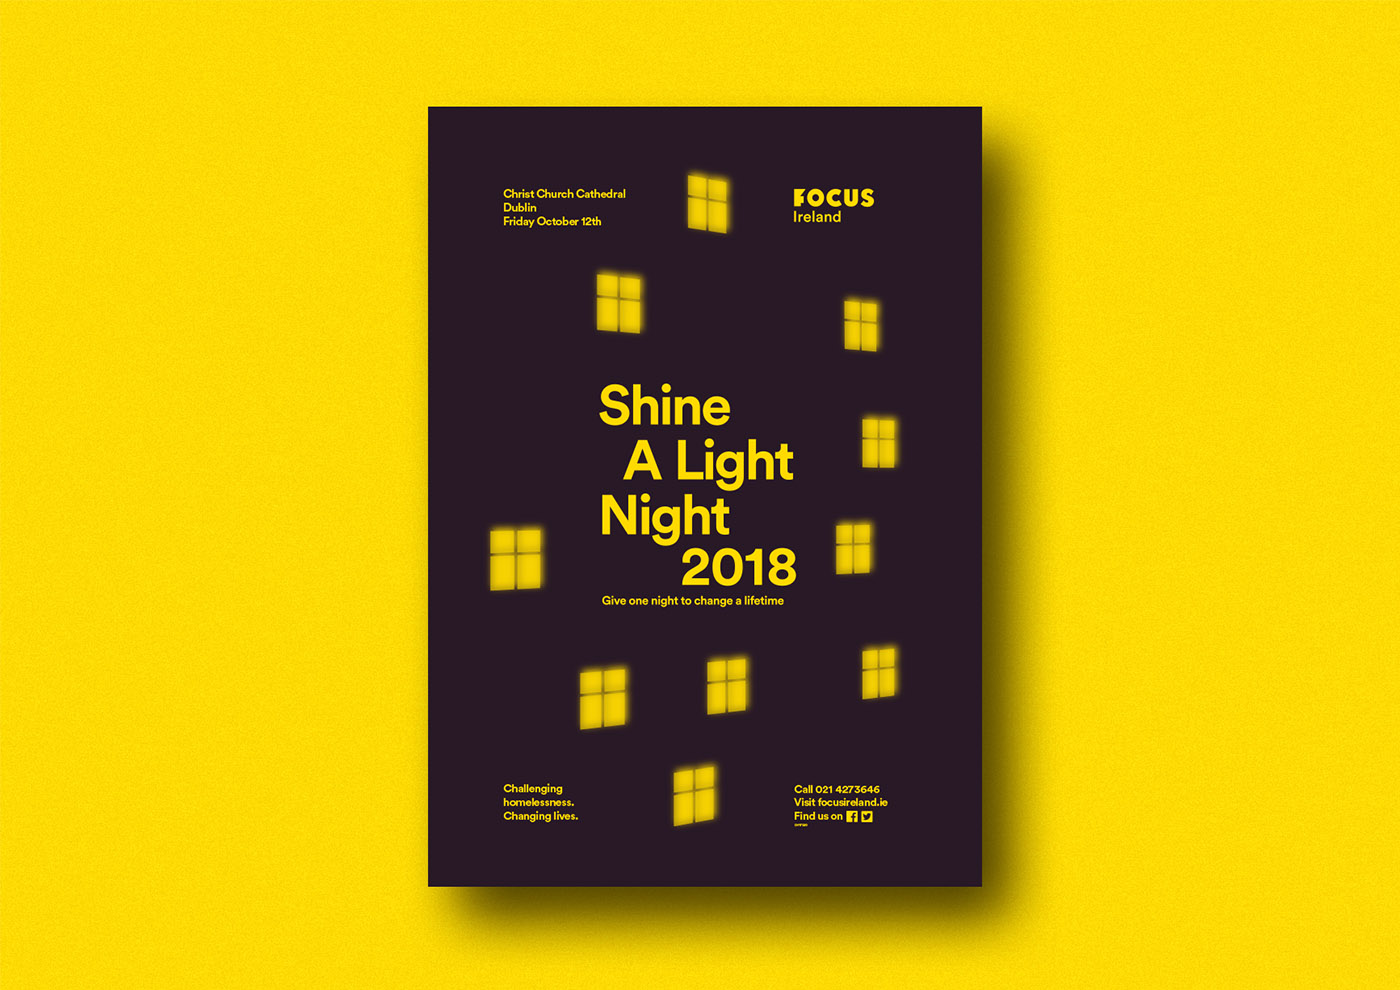 Cover image: Shine a Light Night